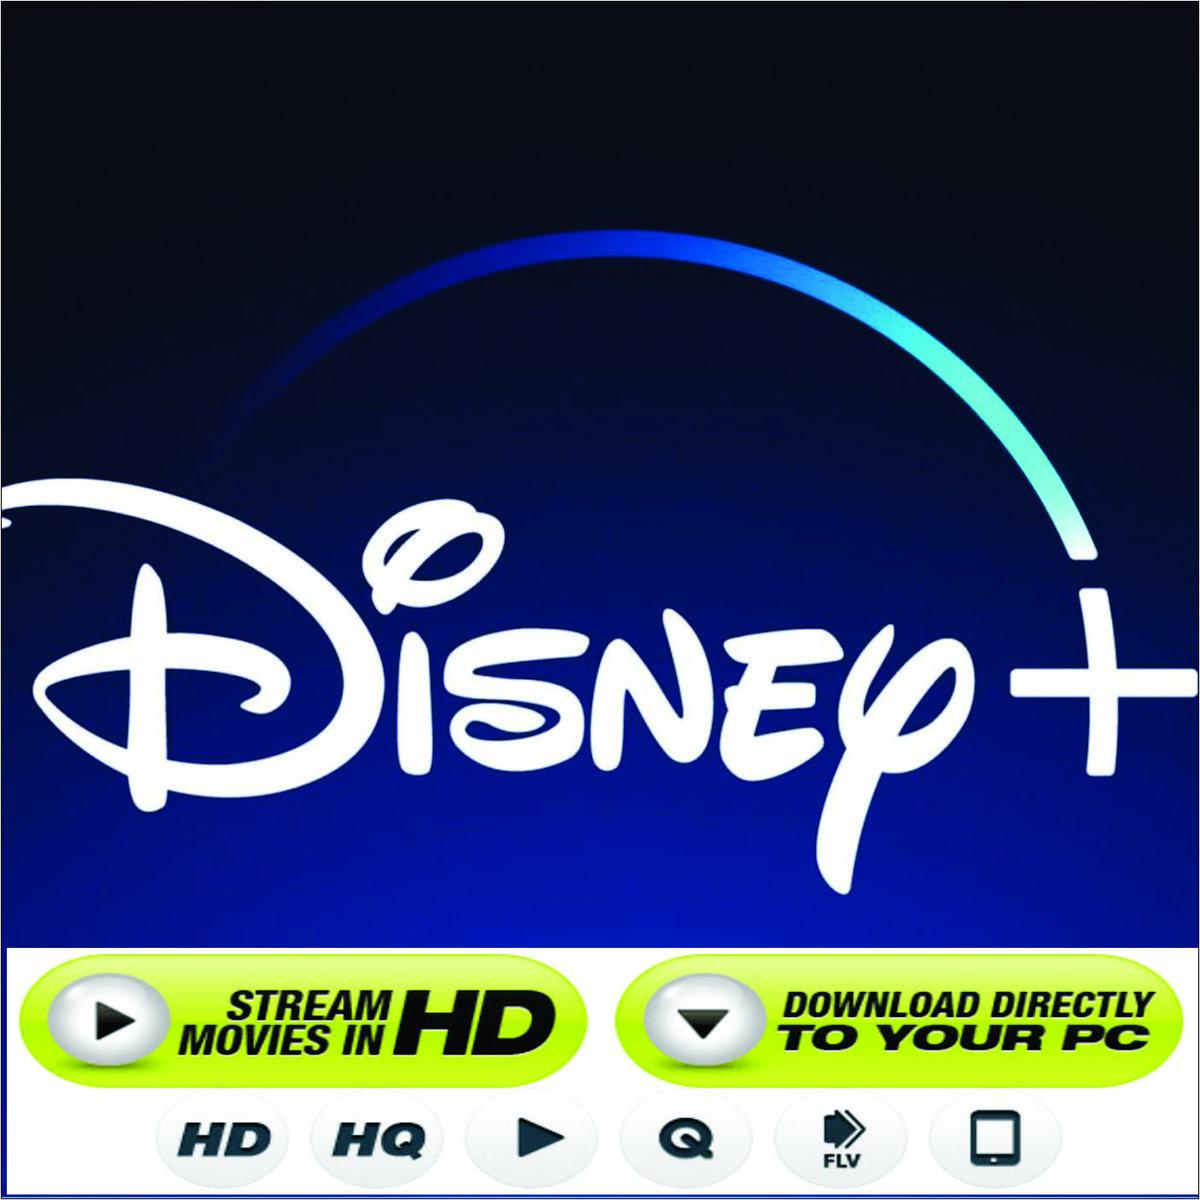 Full Watch Lee Daniels The Butler 2013 Online Hd Full Movie Free Disneyclubfilm